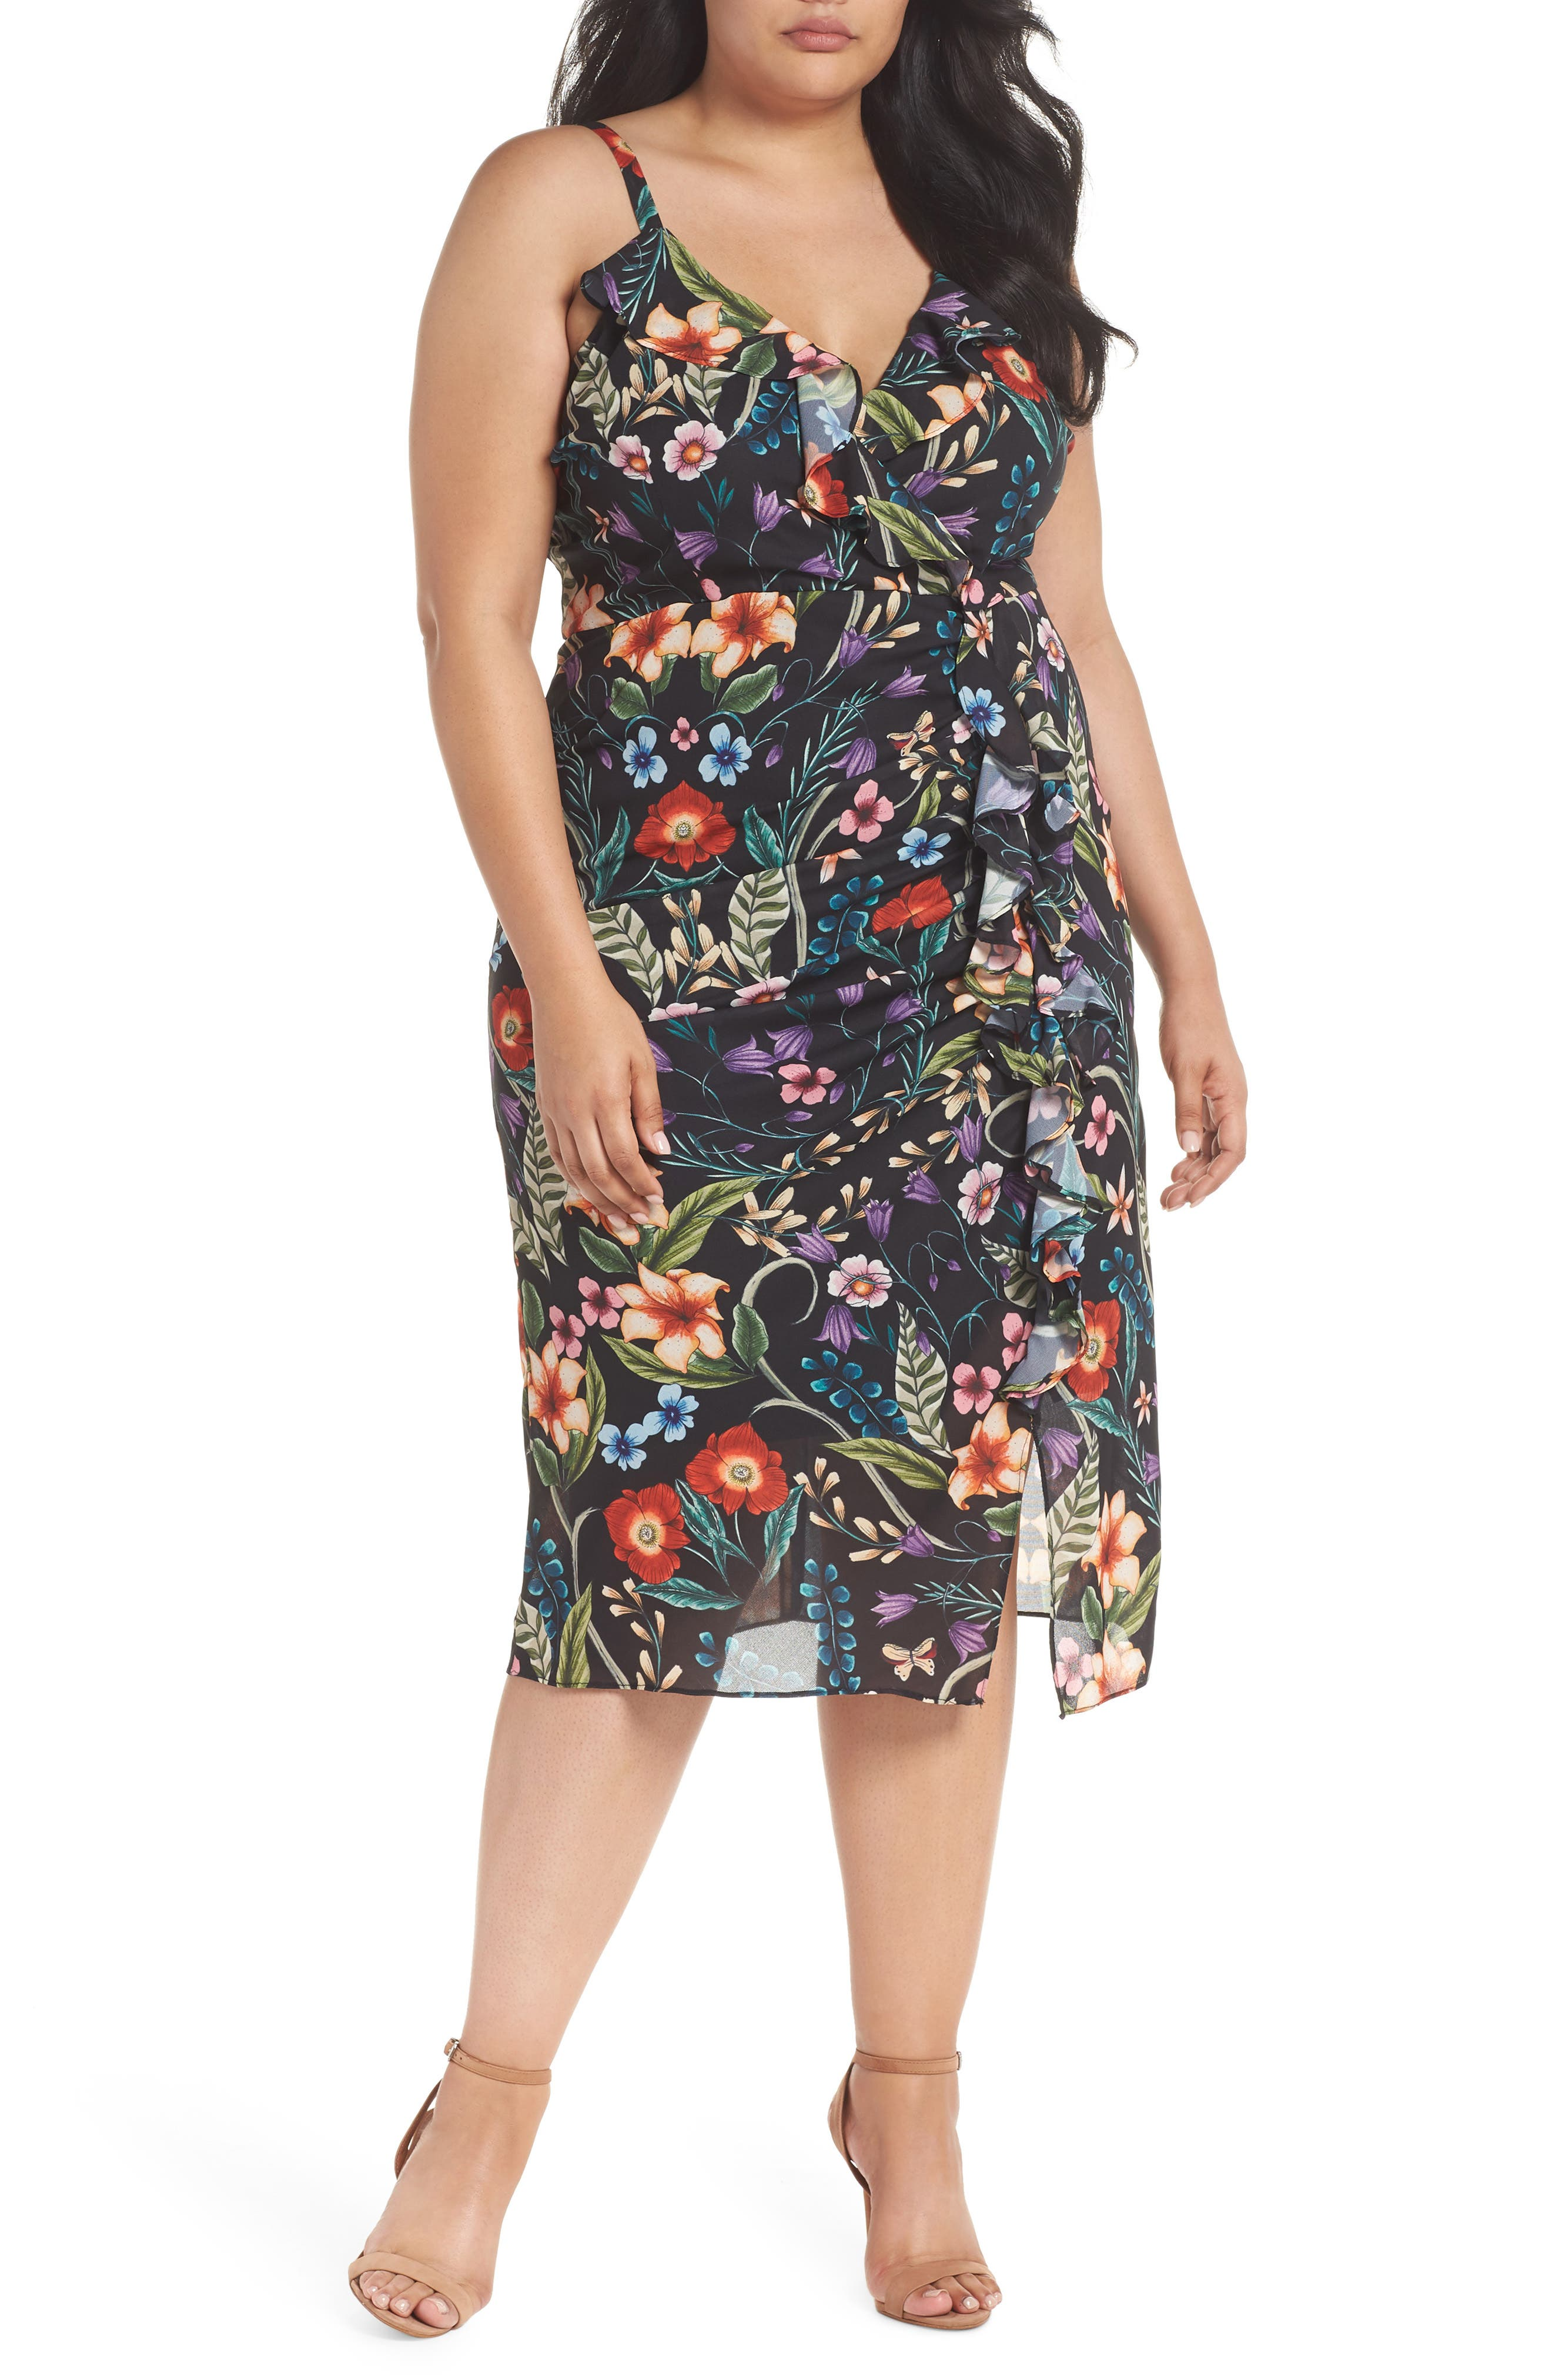 Alternate Image 1 Selected - Cooper St Gardenia Ruffle Slipdress (Plus Size)